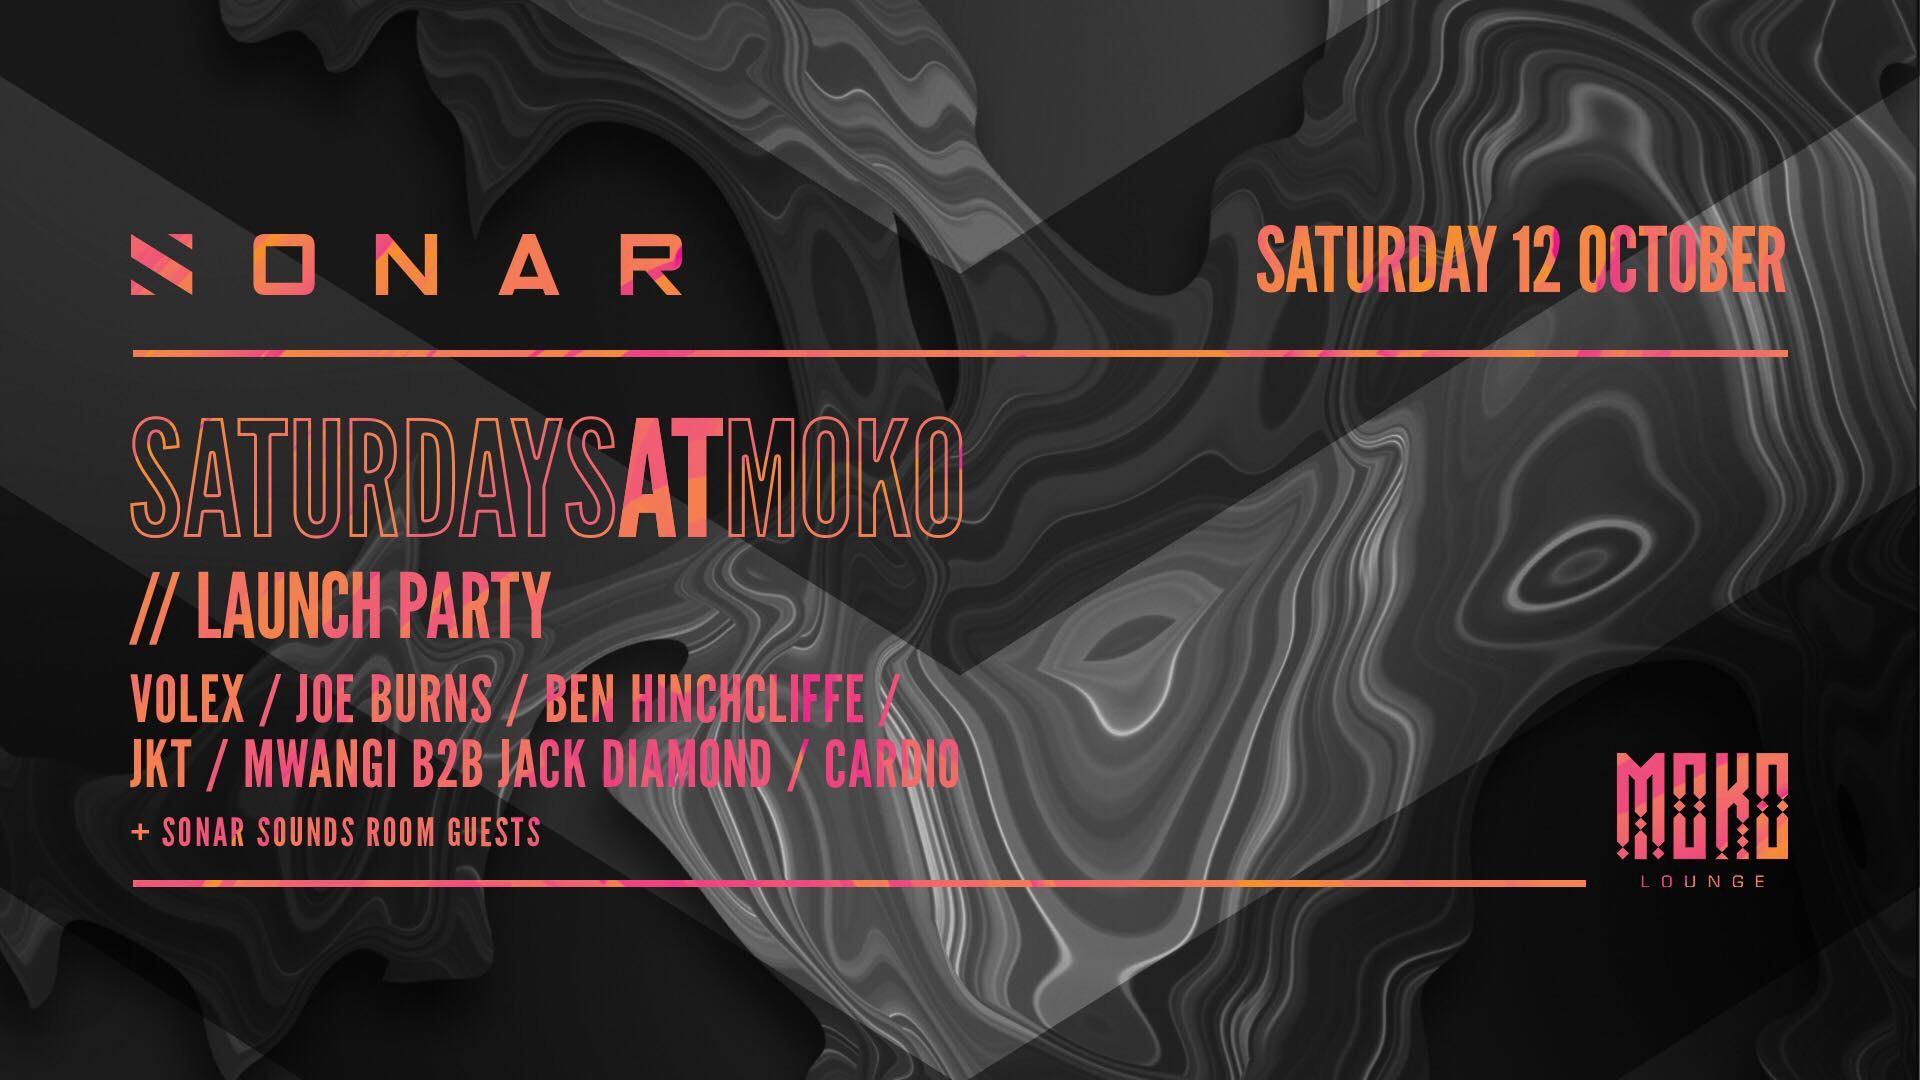 SONAR Events Presents: Sonar Saturday Launch